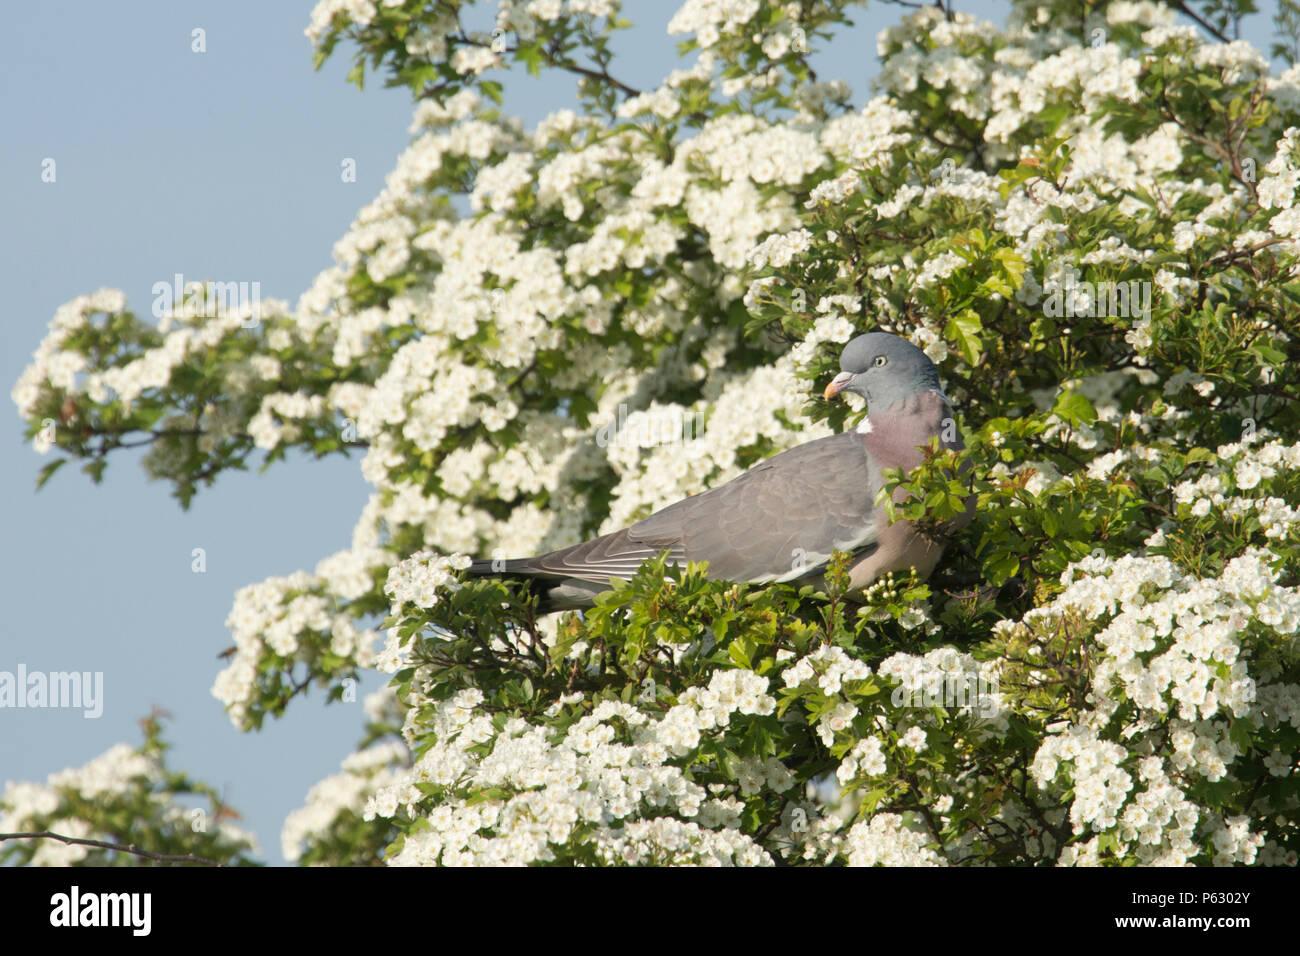 Wood Pigeon, Columba palumbus, in Hawthorn tree, Crataegus monogyna, in blossom, May Tree, May blossom, Norfolk, UK. May - Stock Image